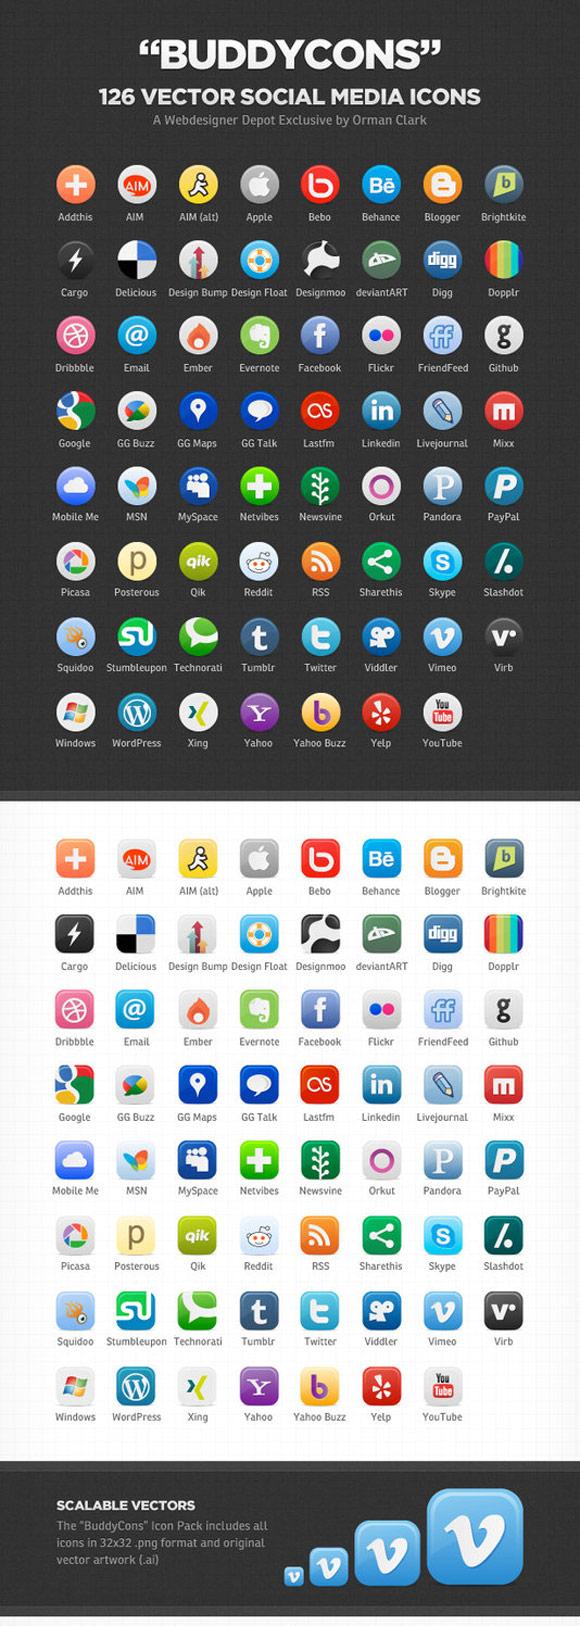 Vector Social Media Icons by Ormanclark